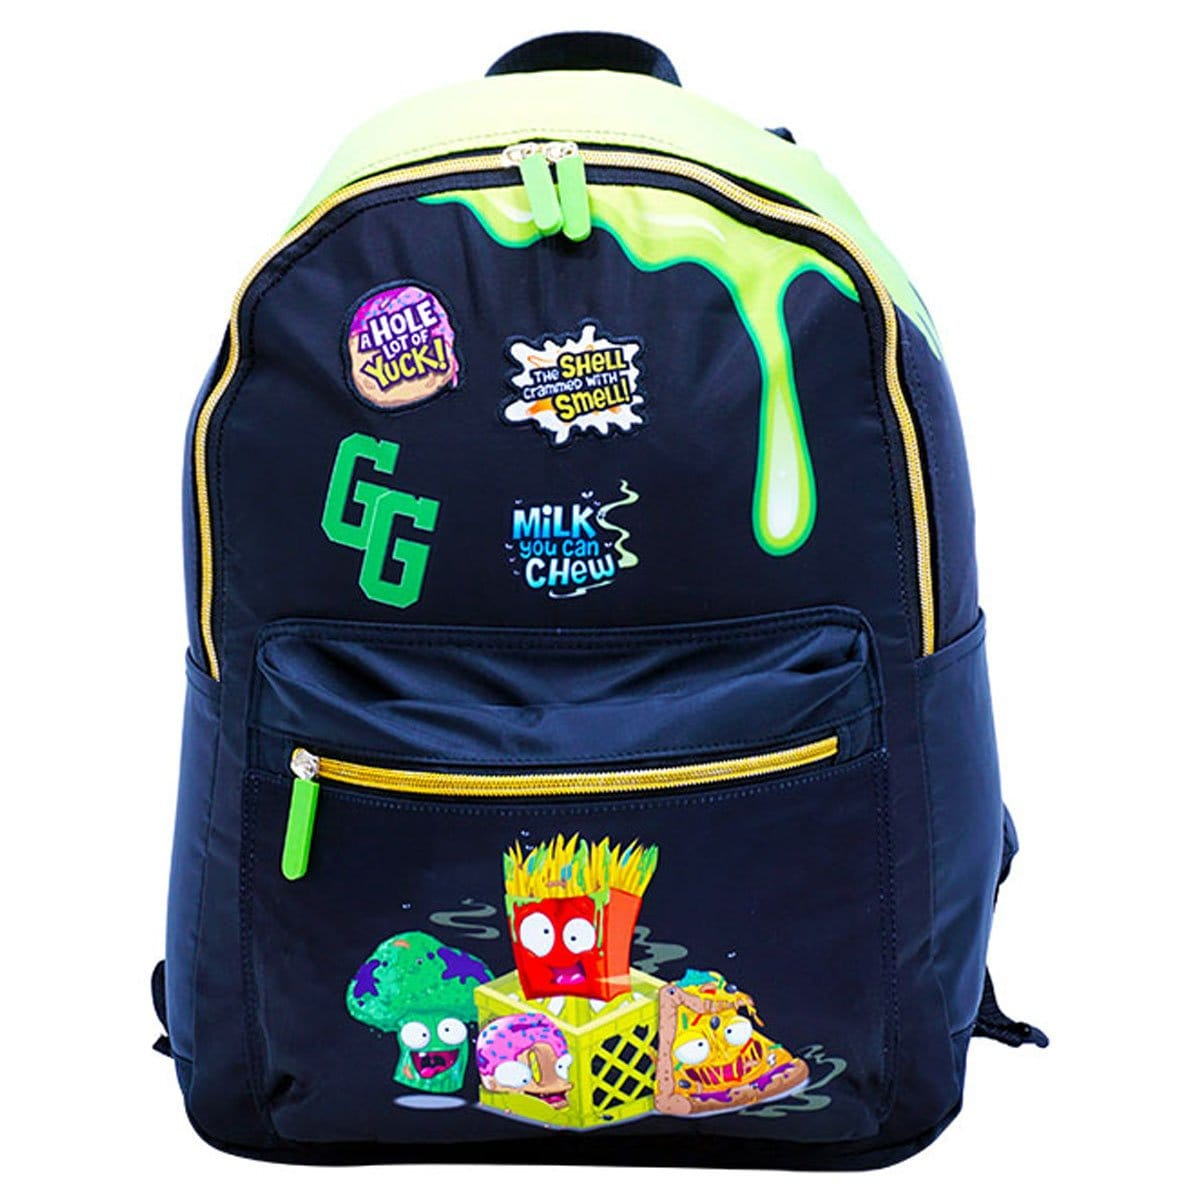 6d961041eb3 Mochila tipo backpack grossery gang negra 7122 atm packs